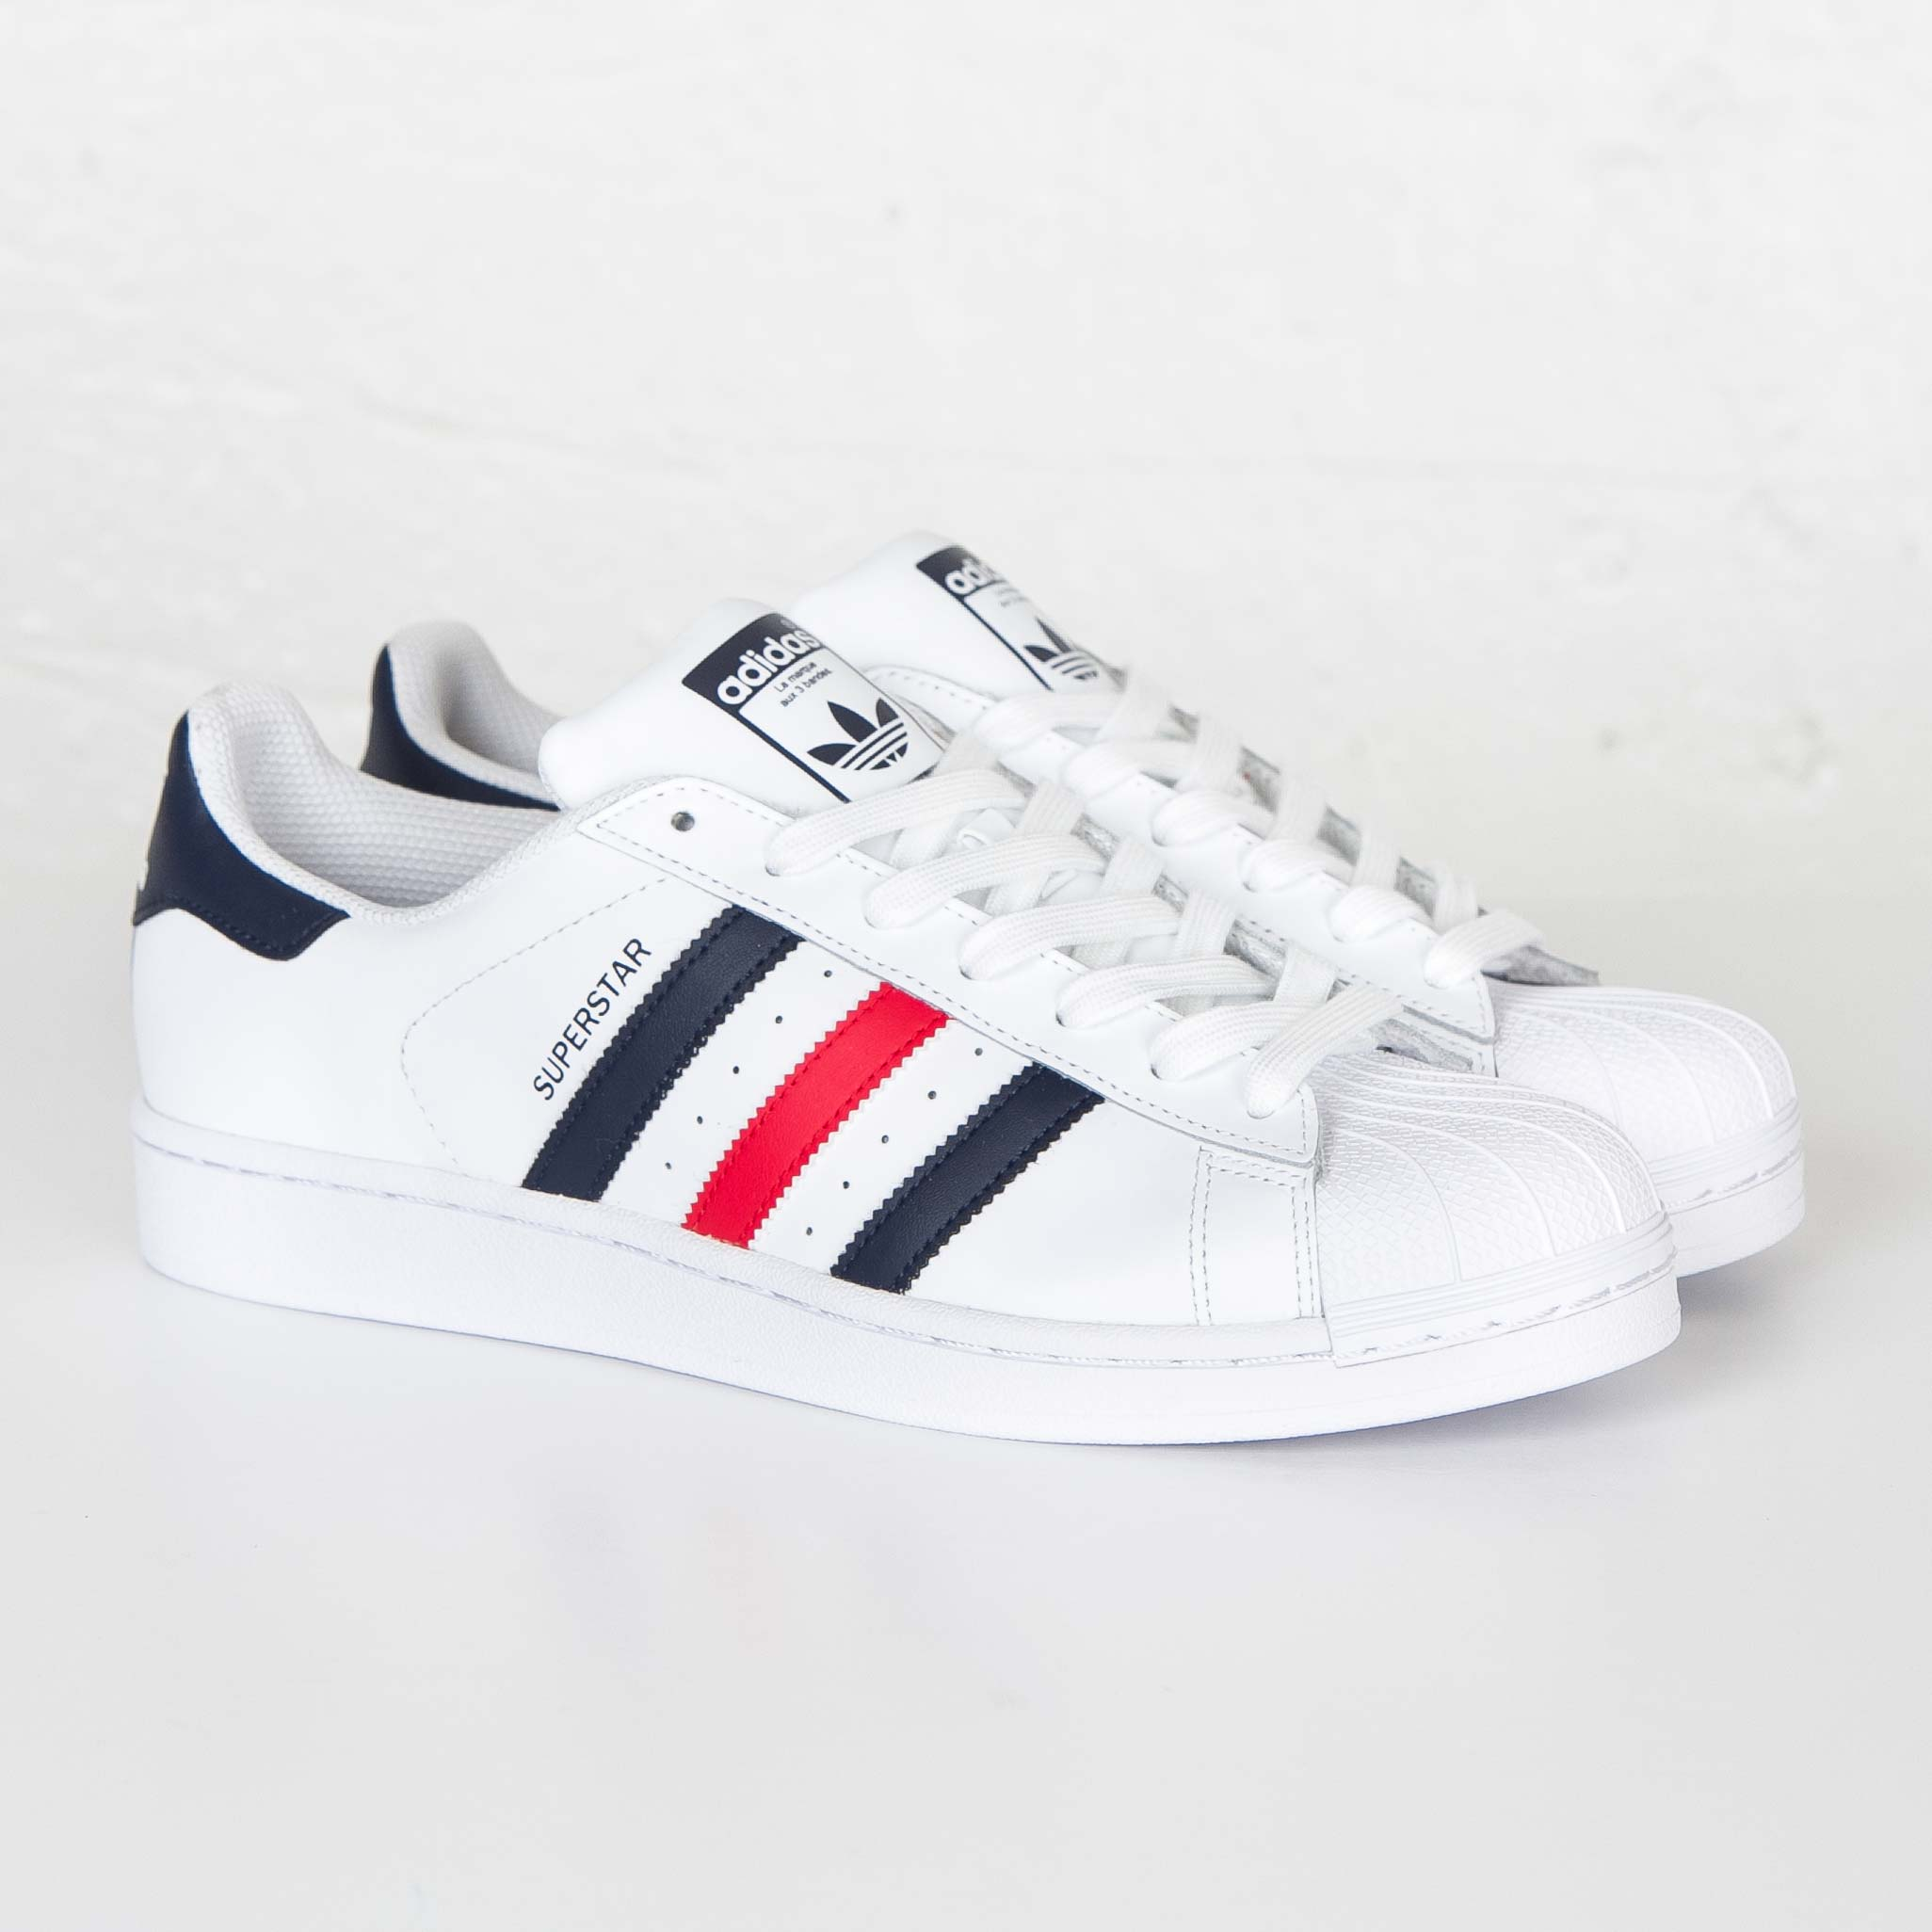 adidas Superstar Foundation S79208 Sneakersnstuff